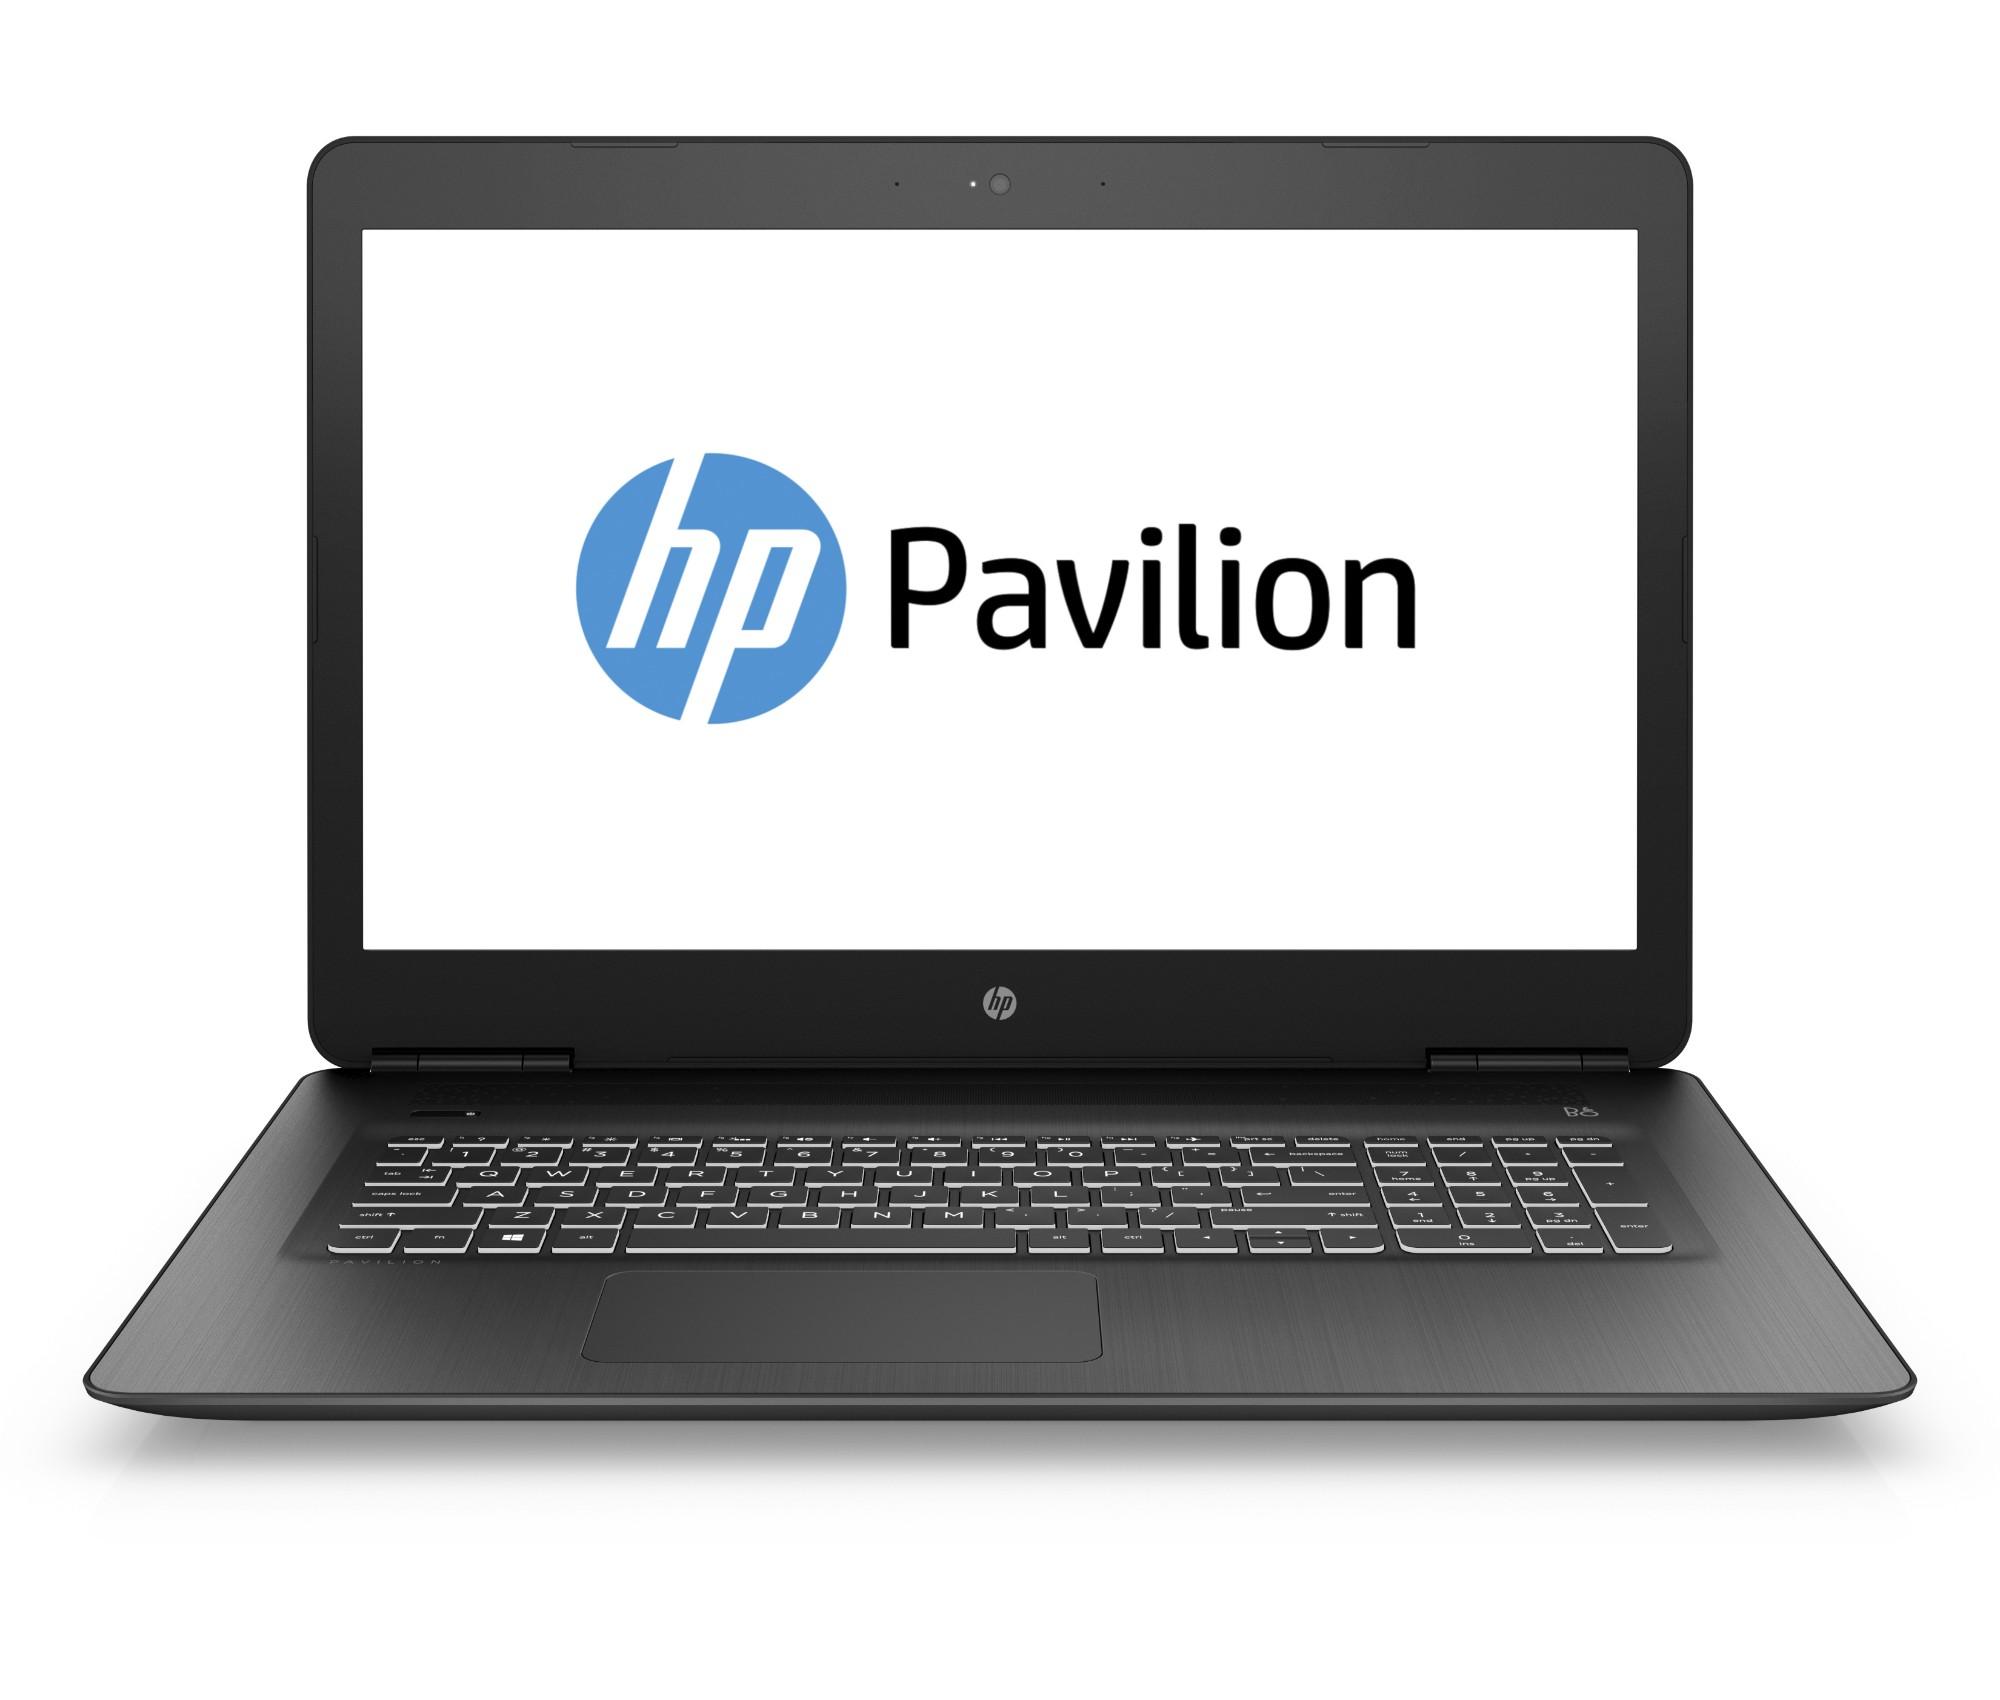 "HP Pavilion 17-ab405na Black Notebook 43.9 cm (17.3"") 1920 x 1080 pixels 8th gen Intel® Core™ i5 i5-8300H 8 GB DDR4-SDRAM 1000 GB HDD"